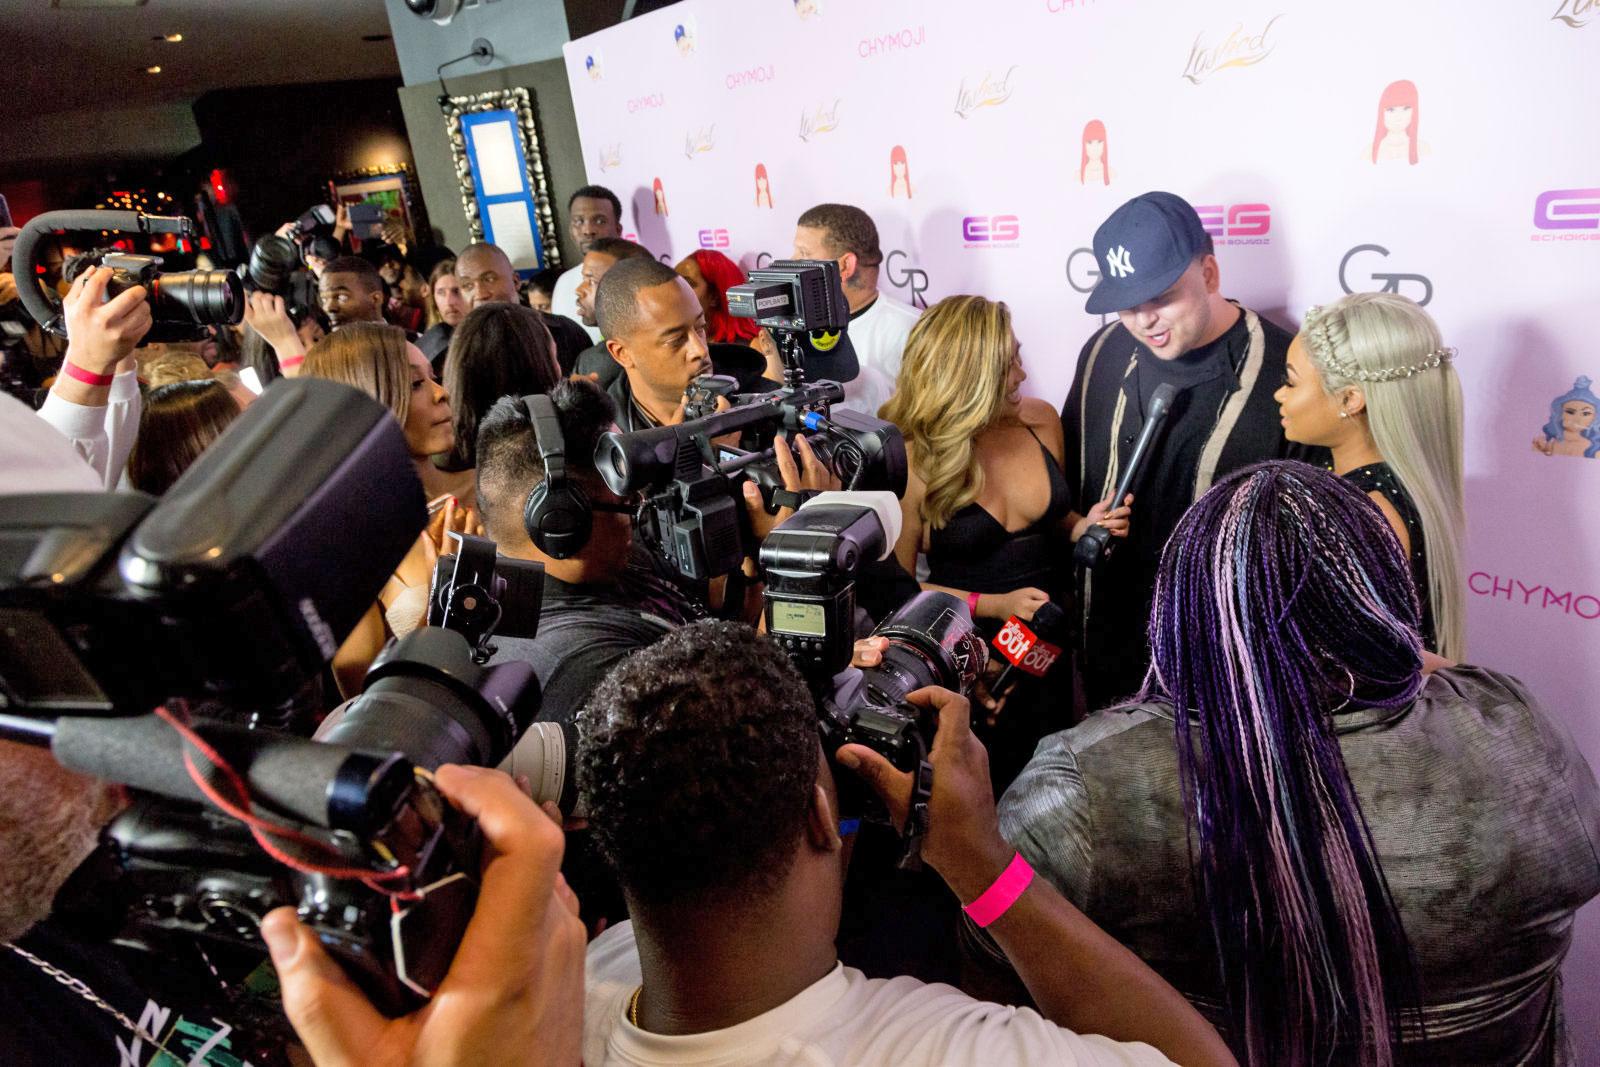 Rob Kardashian's revenge porn is social media's latest headache